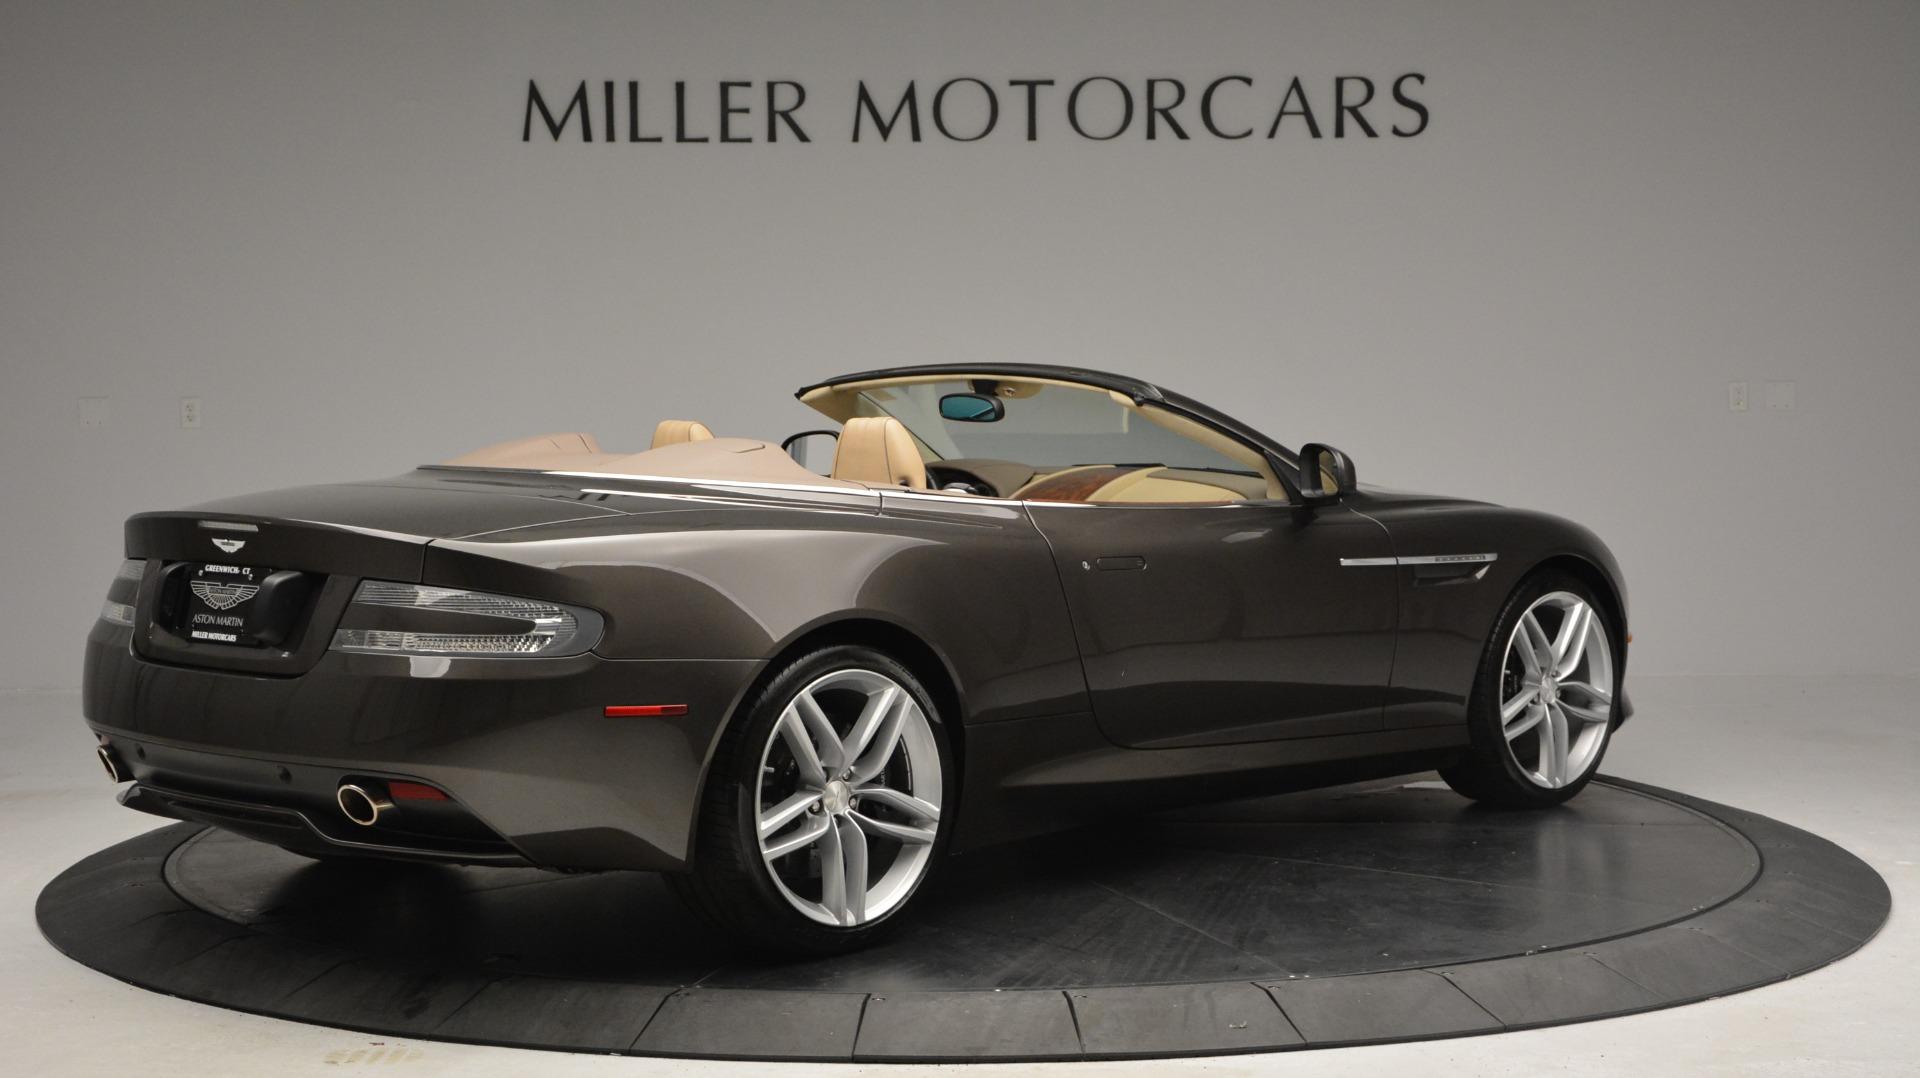 Used 2012 Aston Martin Virage Convertible For Sale In Greenwich, CT. Alfa Romeo of Greenwich, 7613 3351_p8